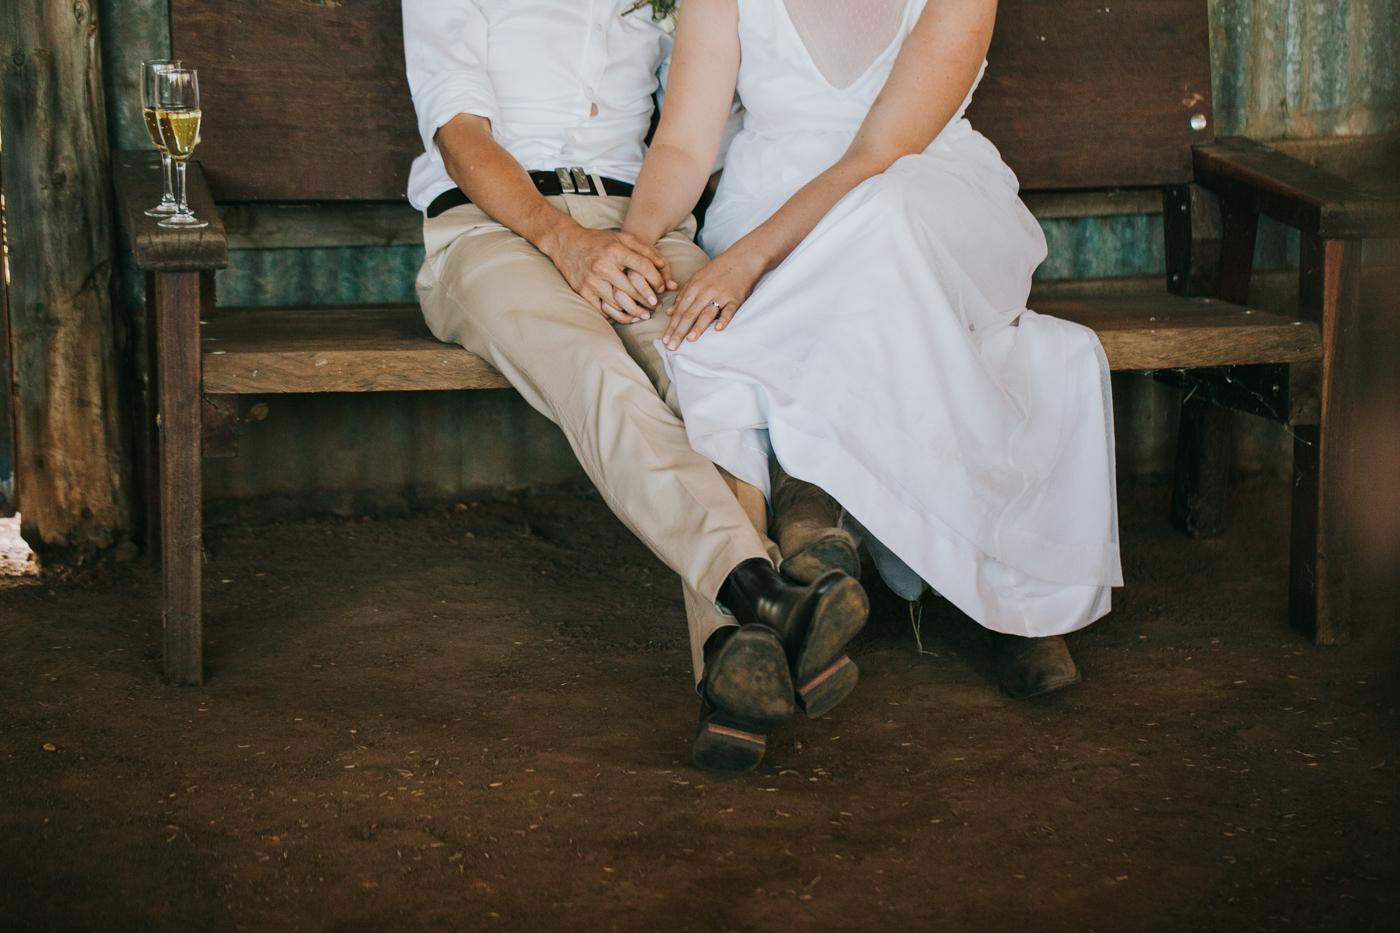 Nicolle & Jacob - Dubbo Wedding - Country Australia - Samantha Heather Photography-232.jpg